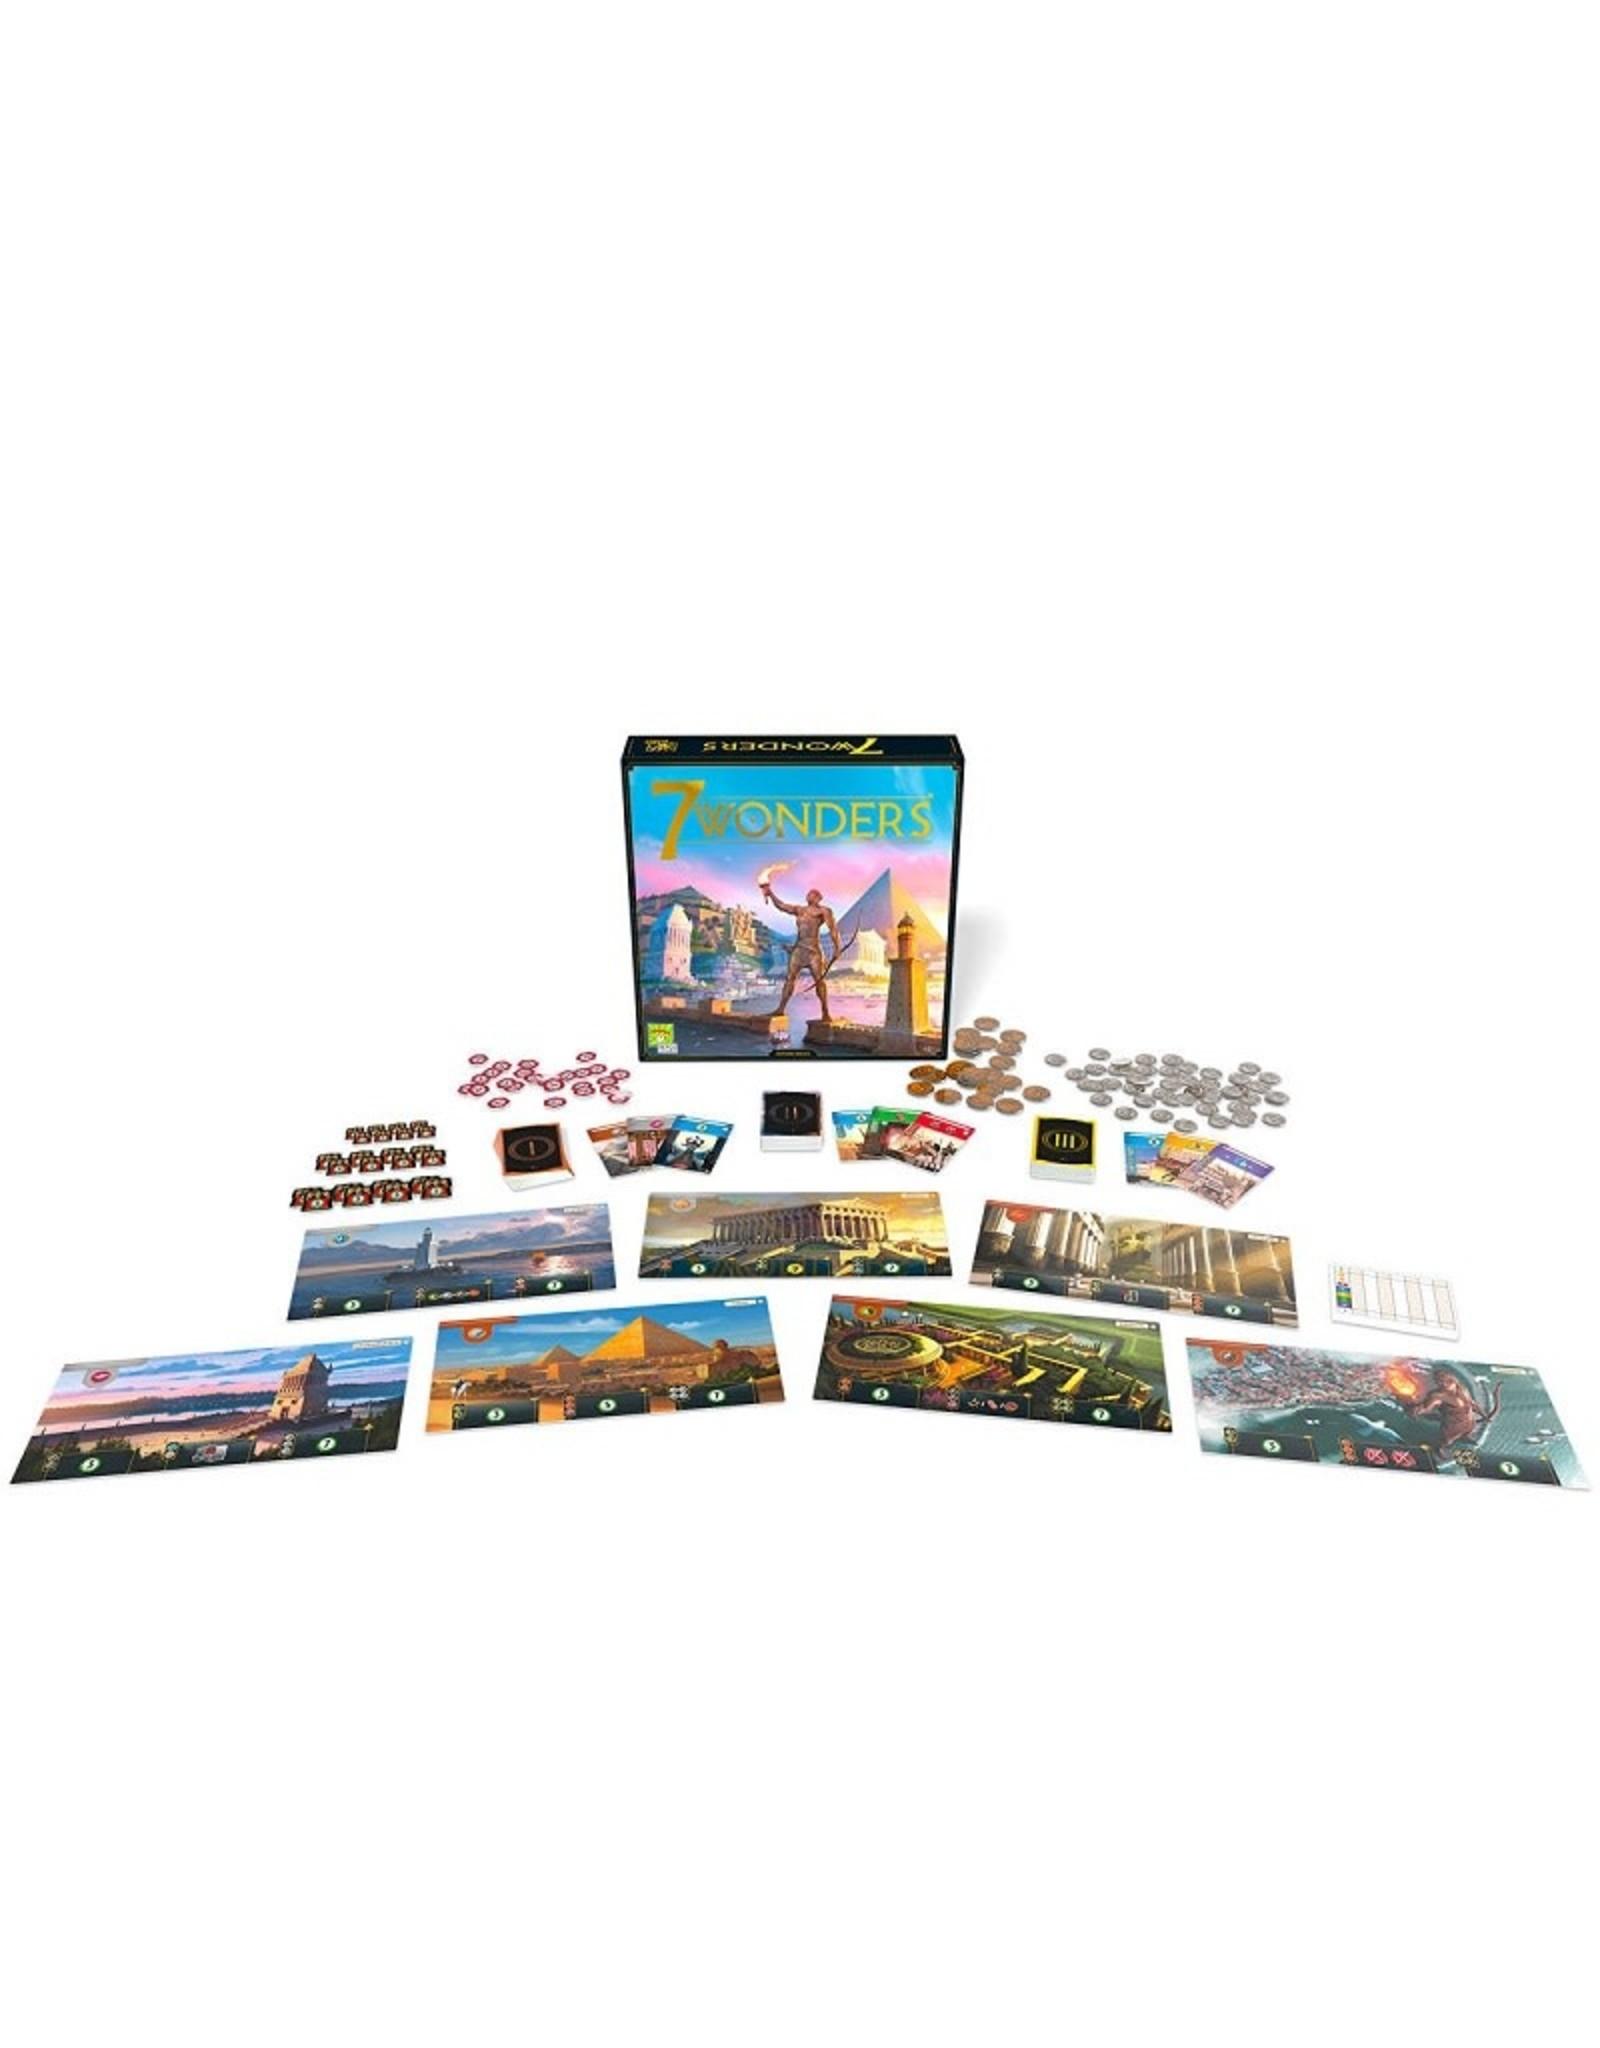 7 Wonders (2nd Edition)